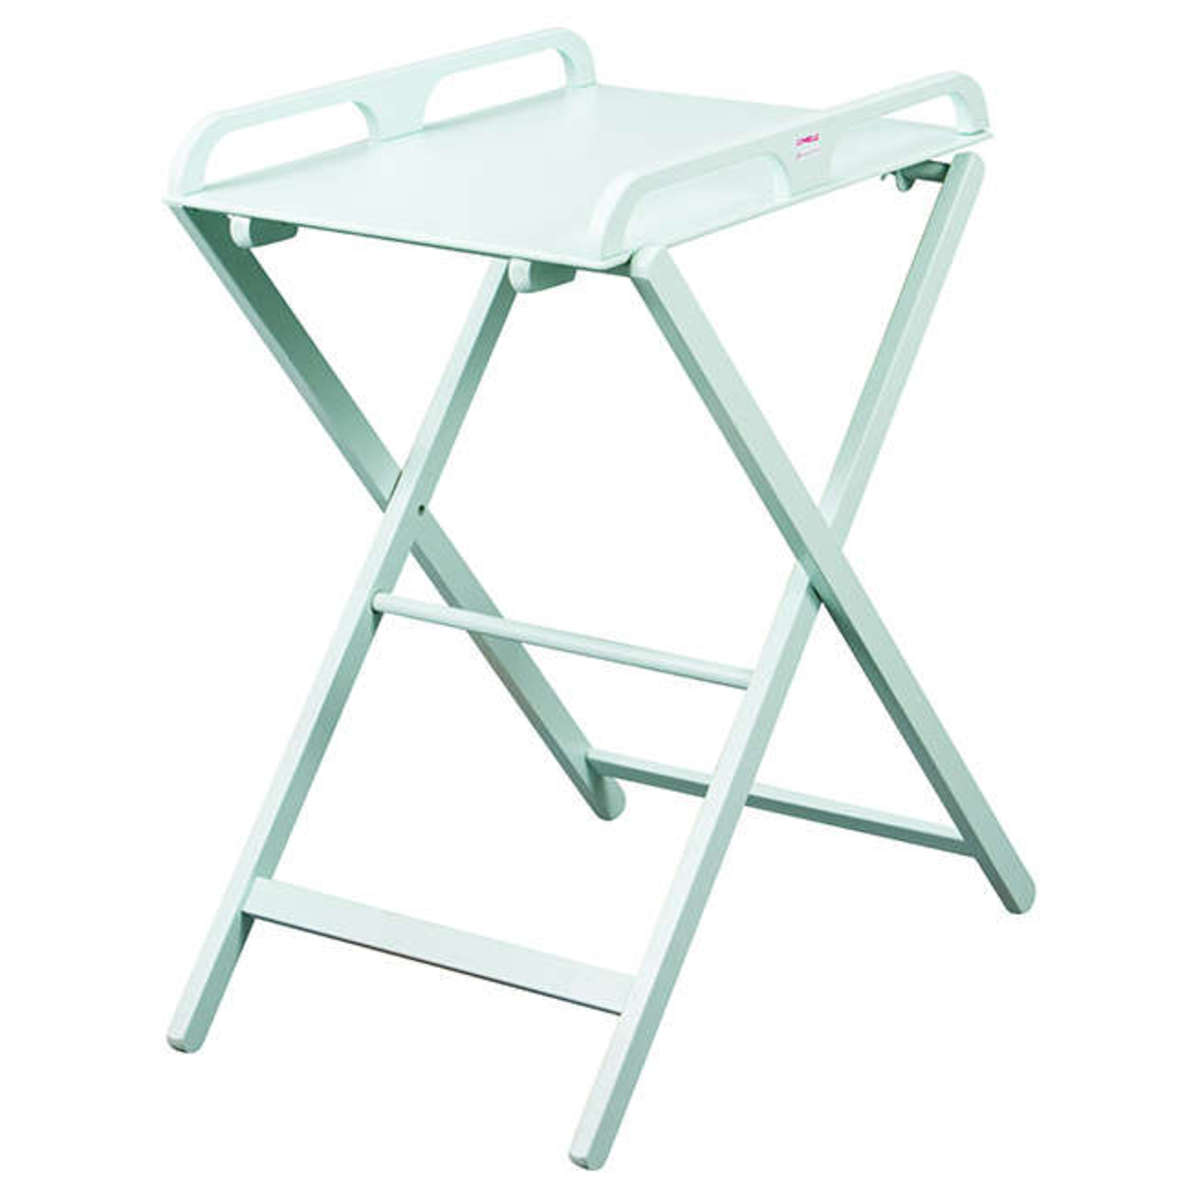 combelle table langer pliante jade laqu vert mint table langer combelle sur l 39 armoire. Black Bedroom Furniture Sets. Home Design Ideas